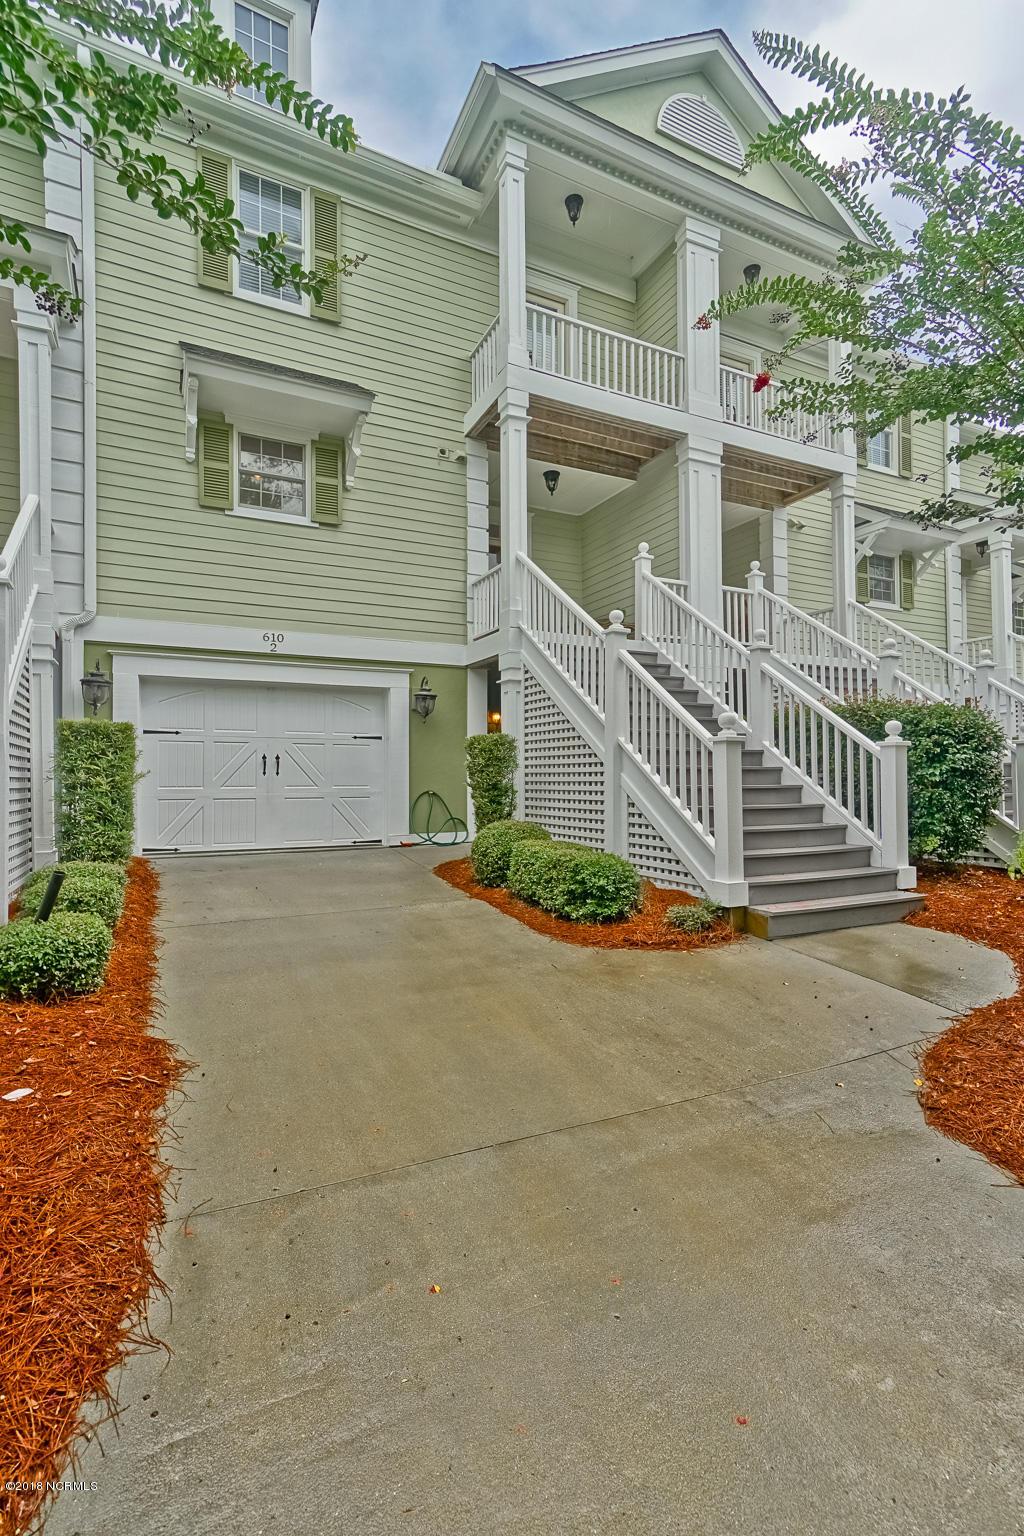 Carolina Plantations Real Estate - MLS Number: 100128010